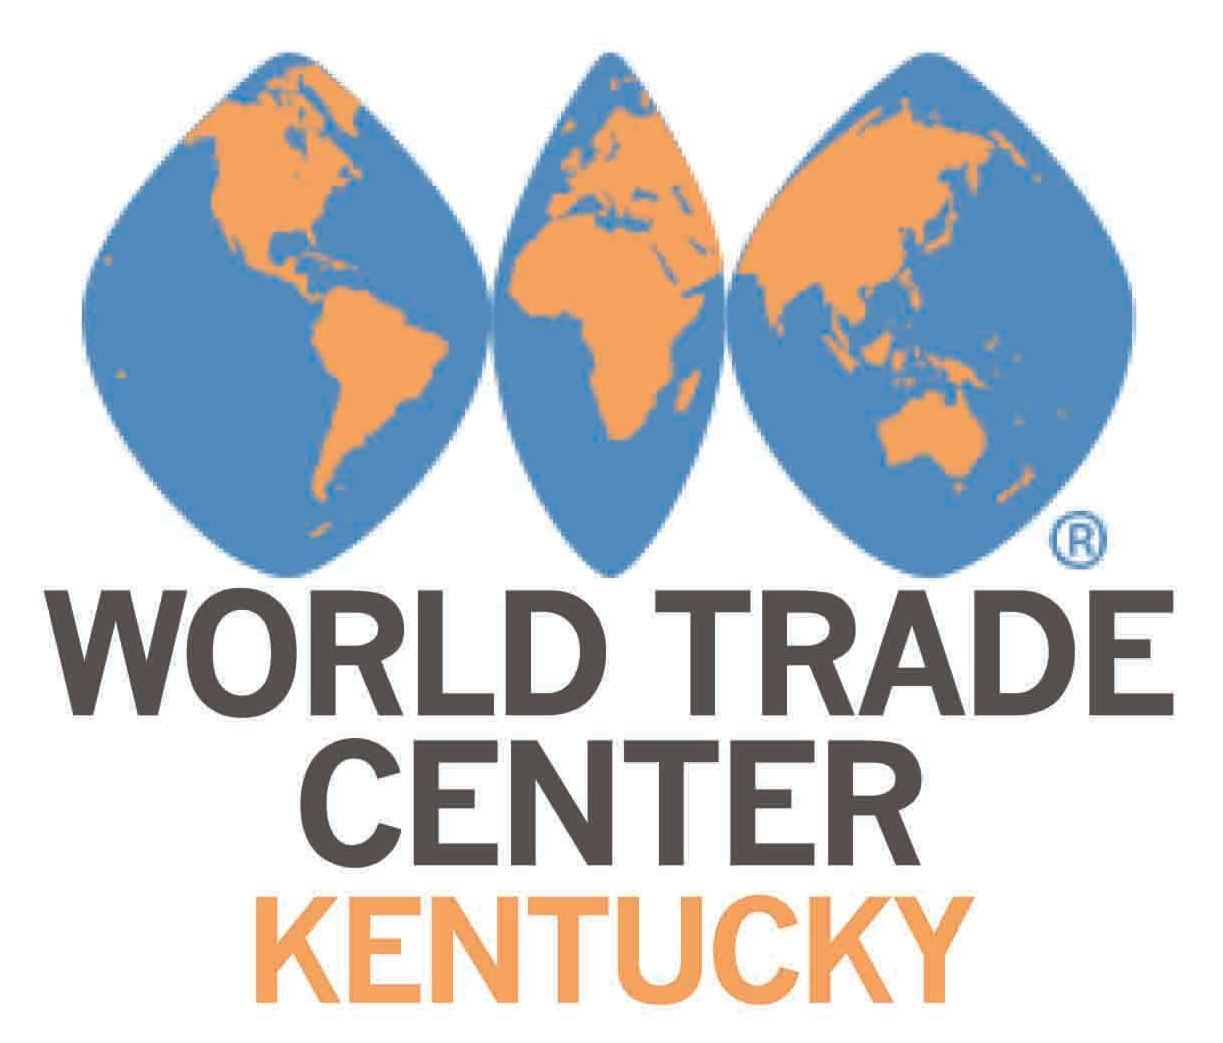 World Trade Center Kentucky